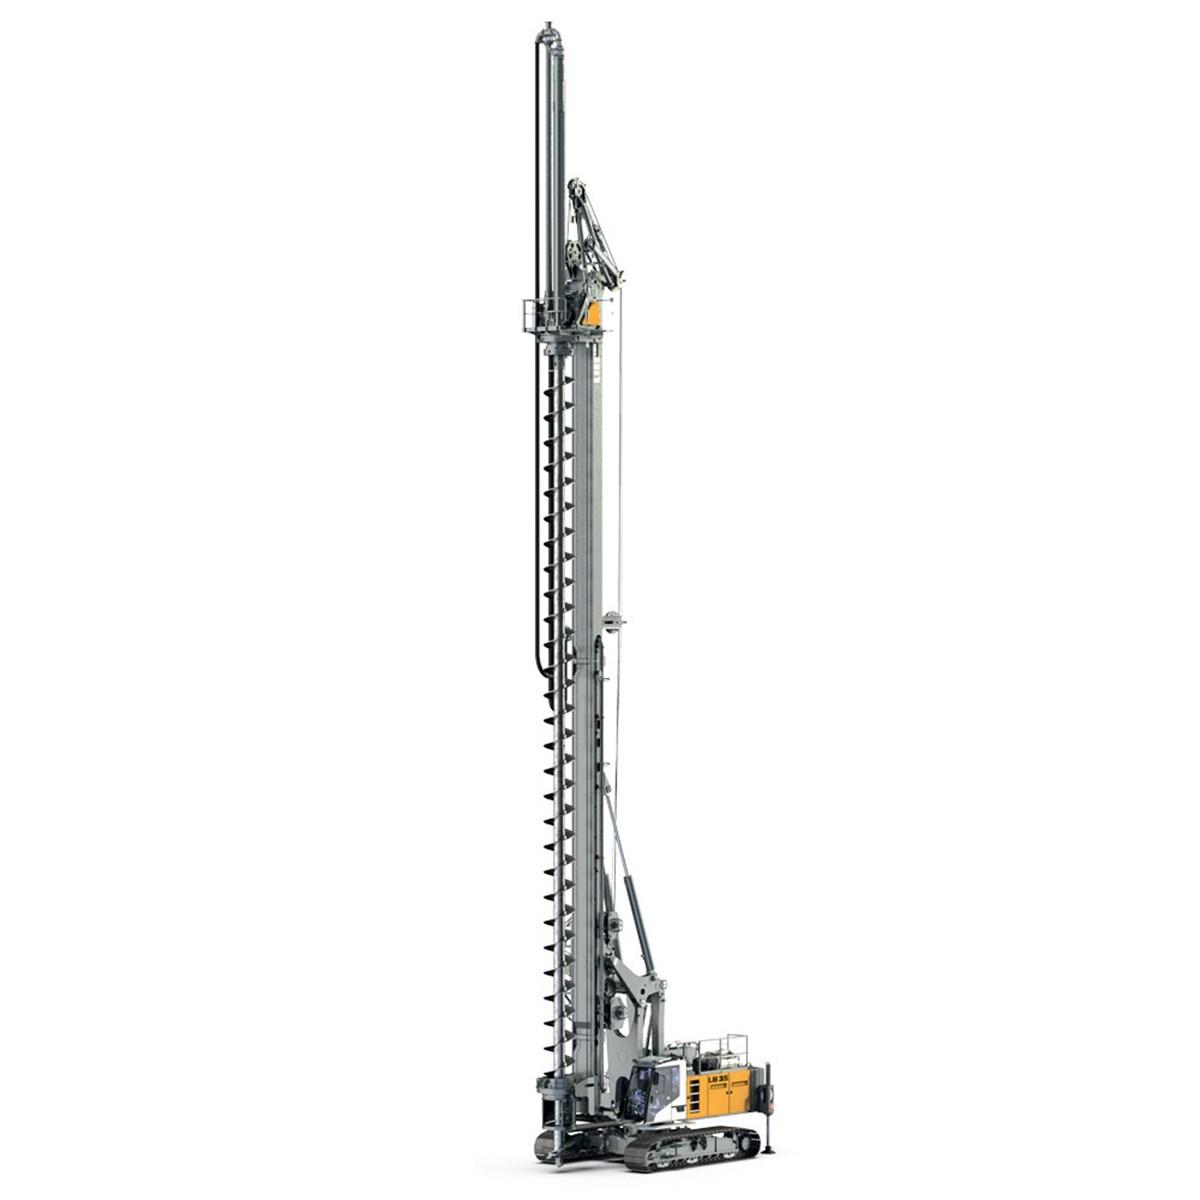 liebherr-lb-35-drilling-rig-bohrgerat-endlosschnecke-continous-flight-auger-3.jpg